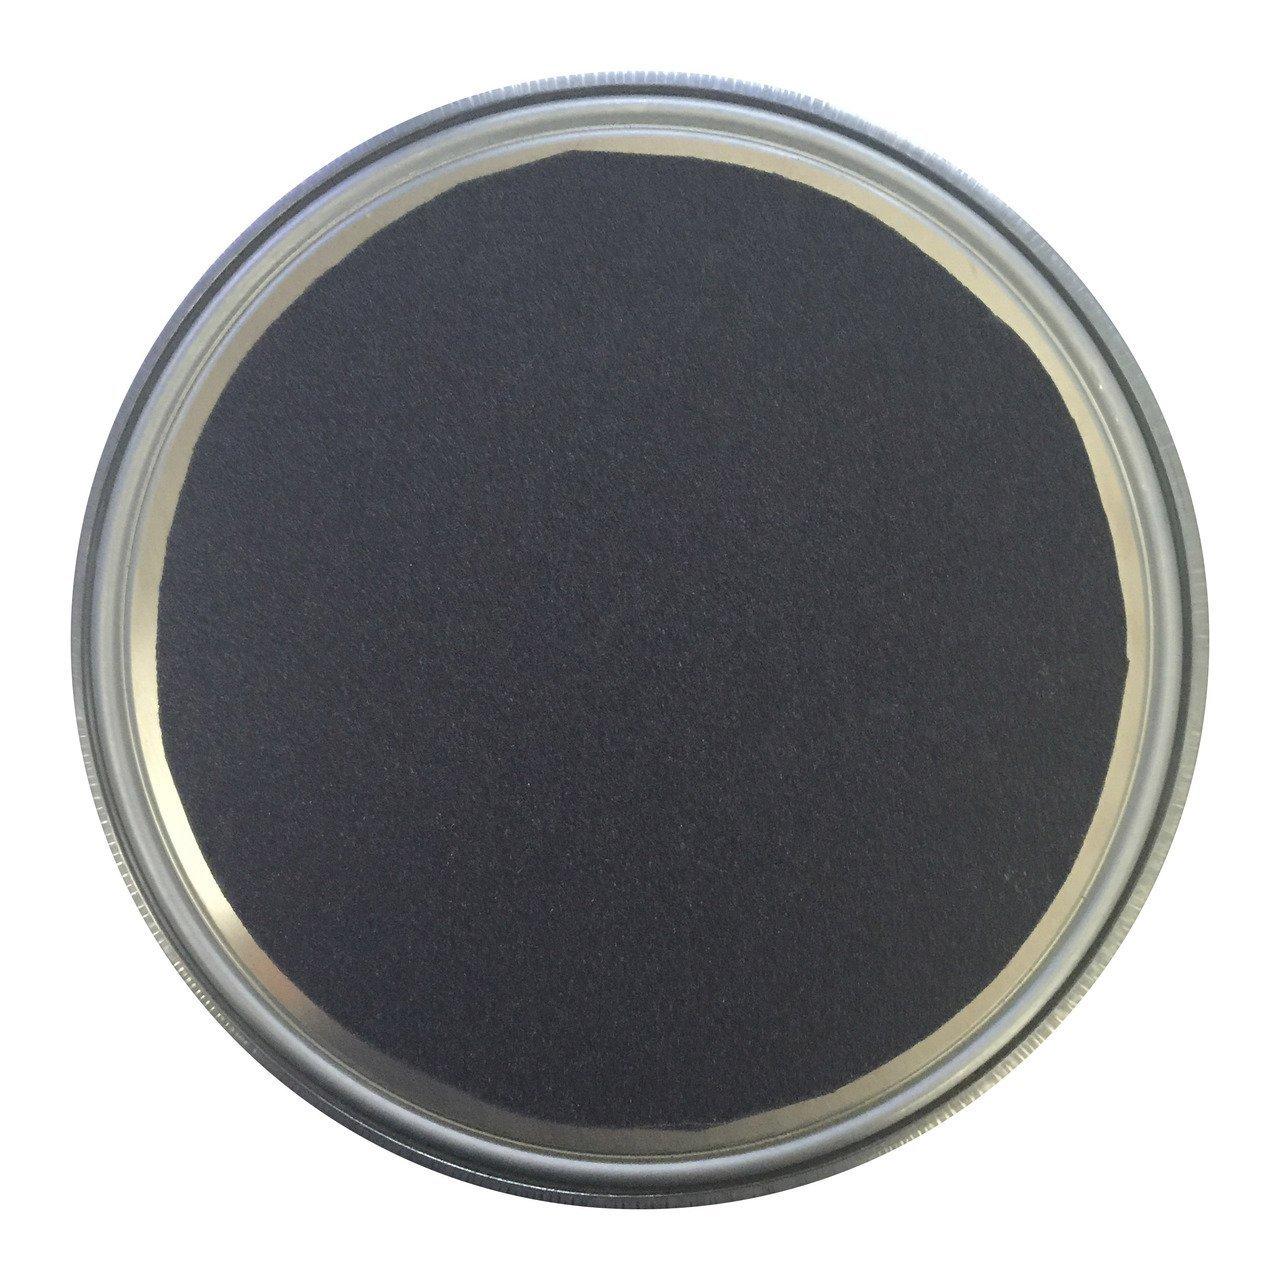 The Mad Spinner アイススケート用 直径12インチ B079NJDQPV ブラック単色